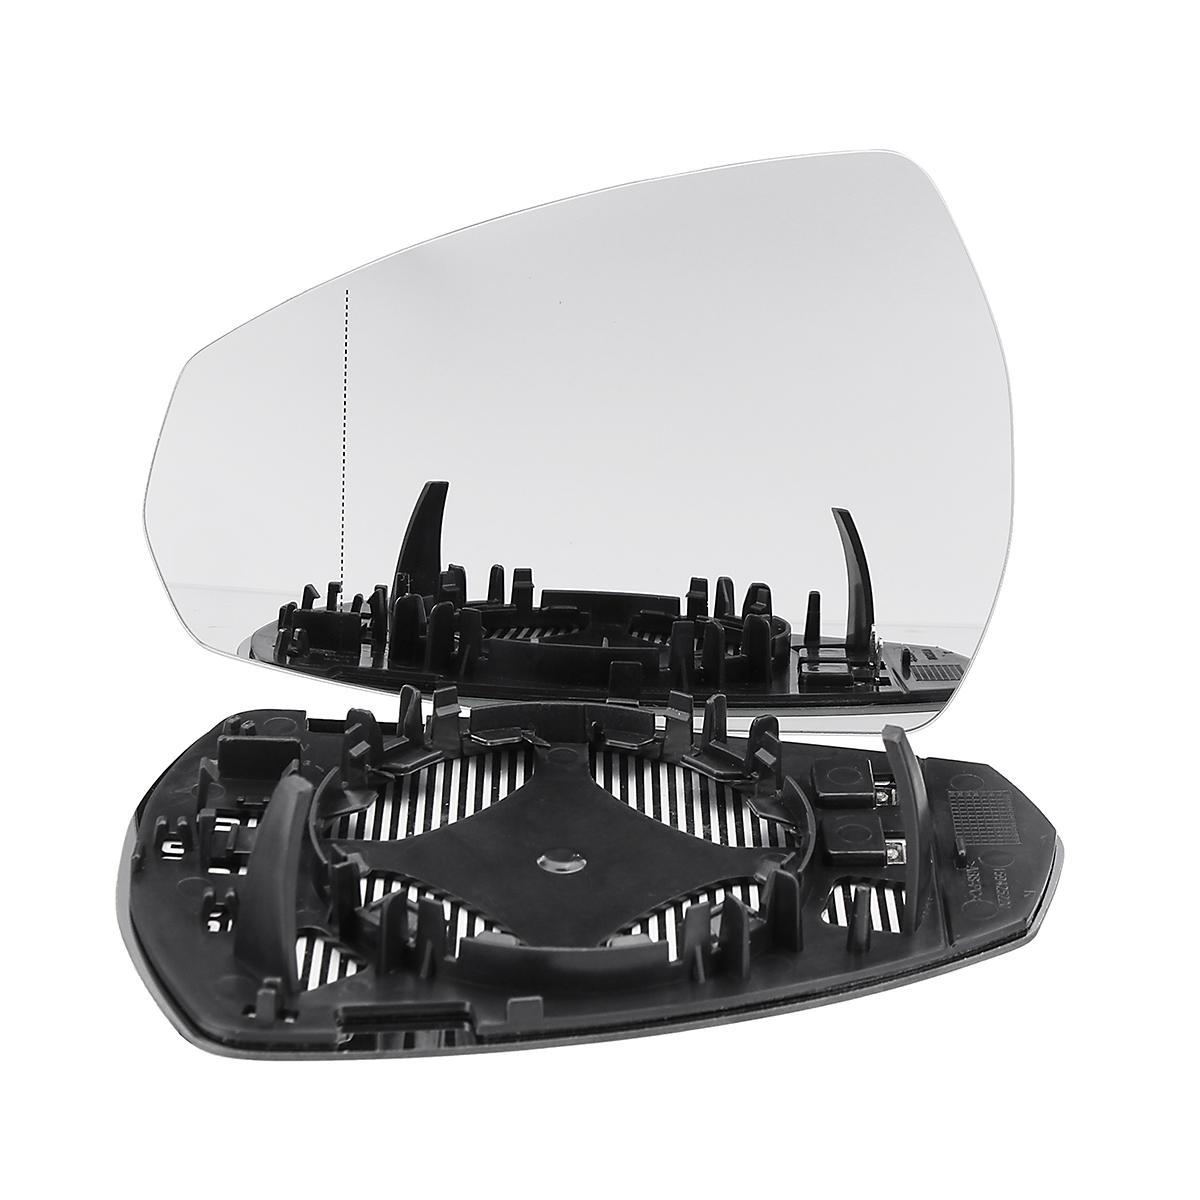 Cristal espejo de ala derecha lado del conductor para Audi A6 2004-2008 climatizada